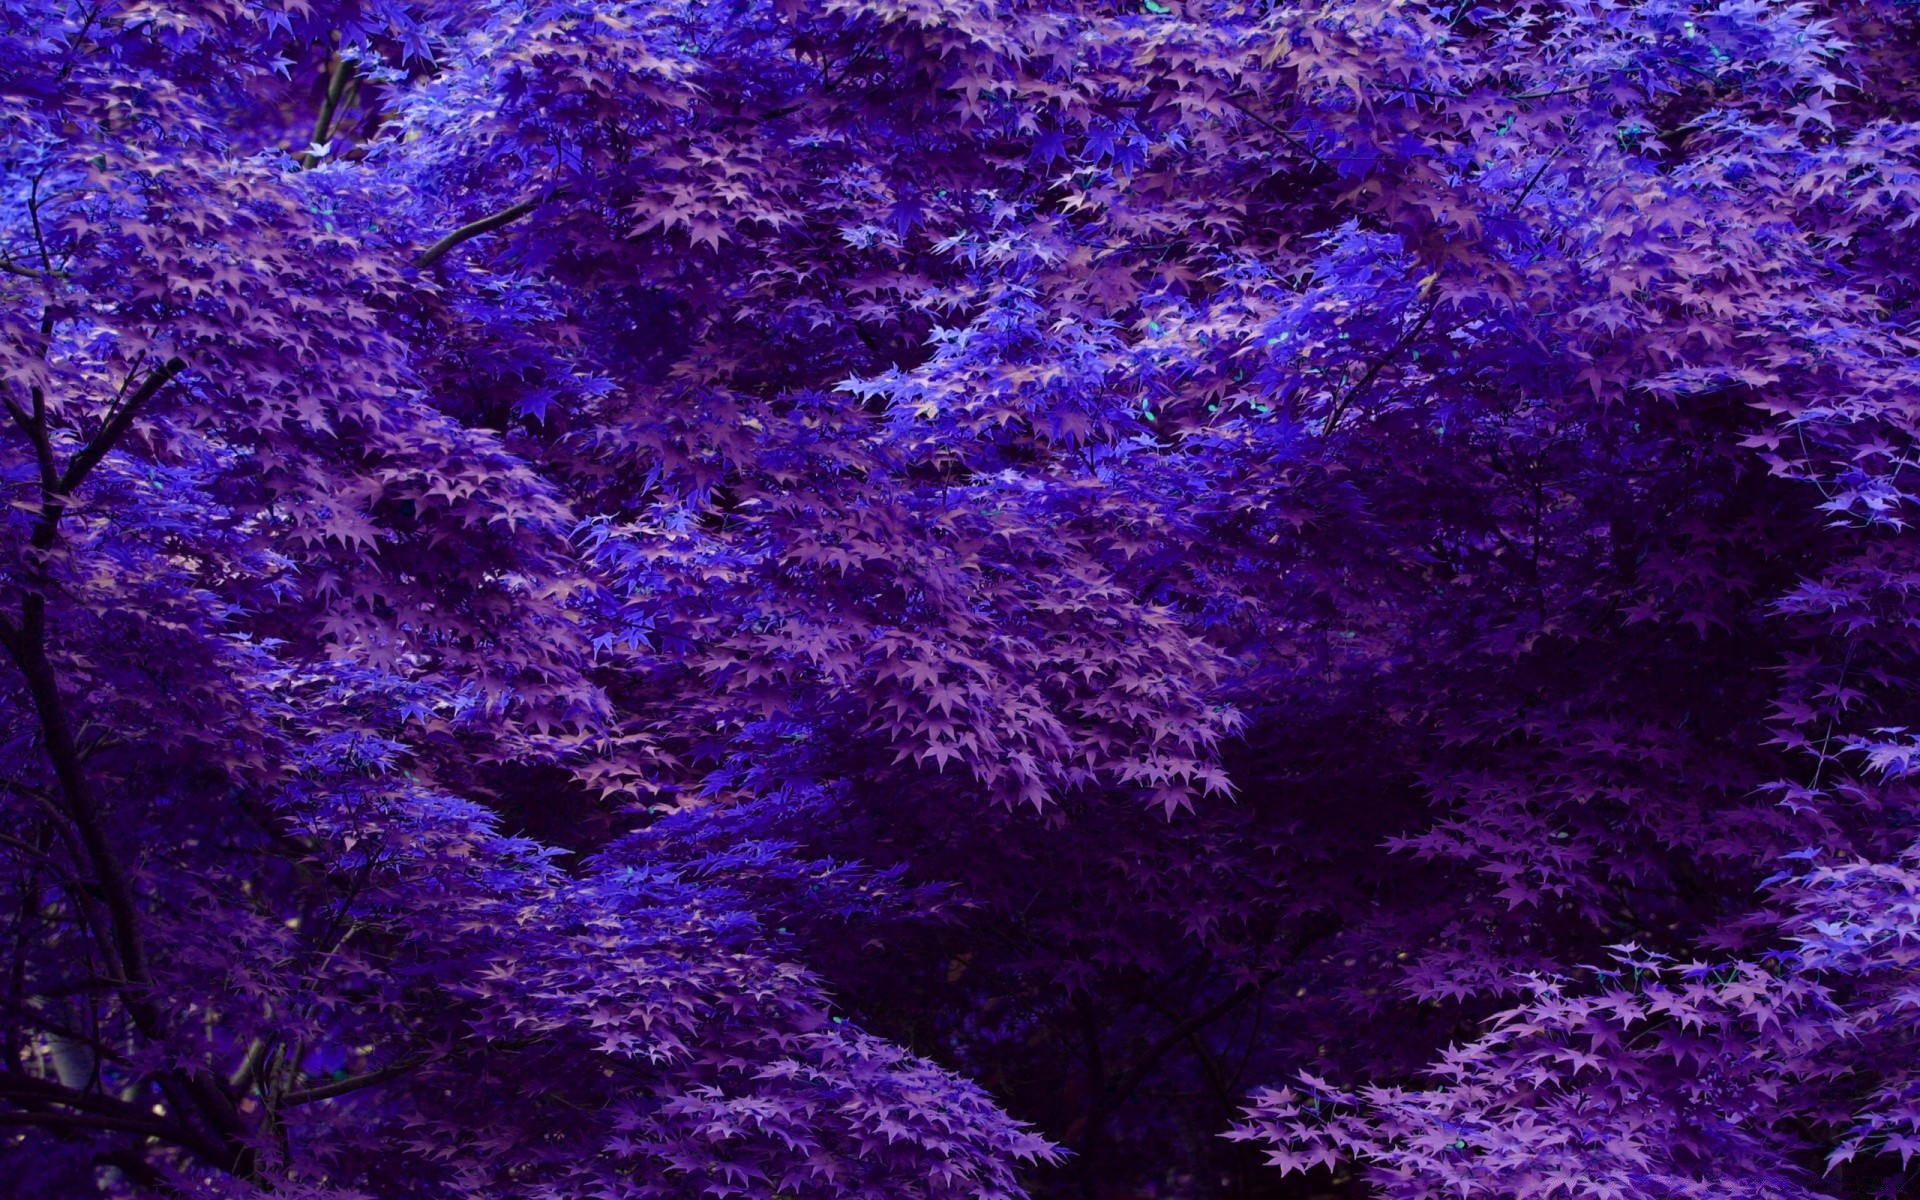 Картинки фиолетового тона